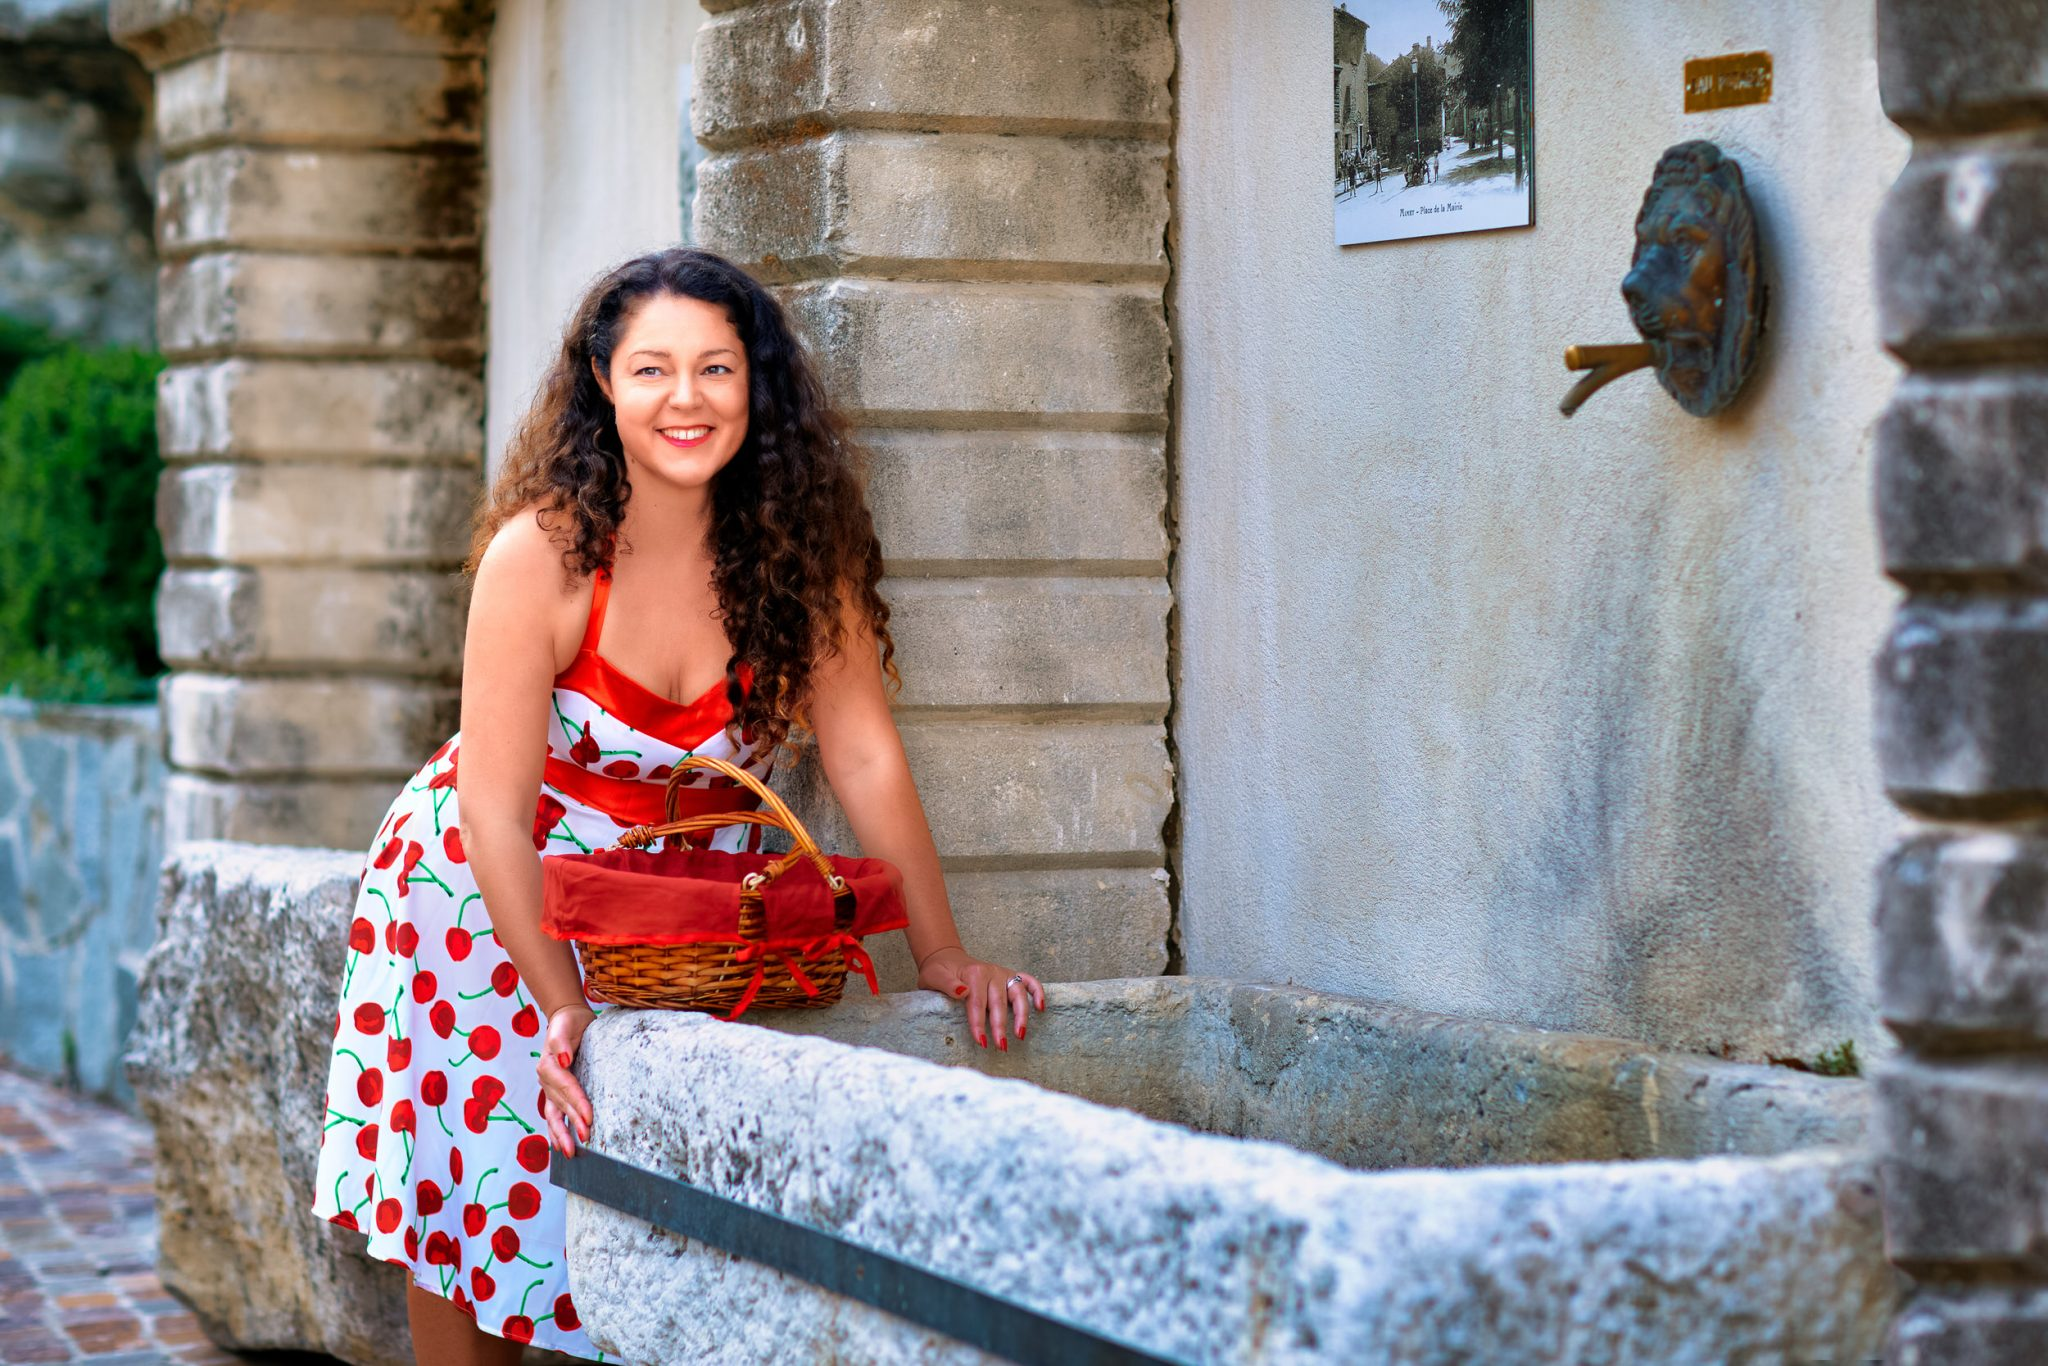 Le 15 09 2020 Séance Pin-up avec Aurore Lieu: Village à Mimet  PHOTOGRAPHE     | Christian Jaegy @digitregards MUSE                     | EOSmodele   http://www.eosmodele.kabook.fr WEB                       | www.digitregards.com